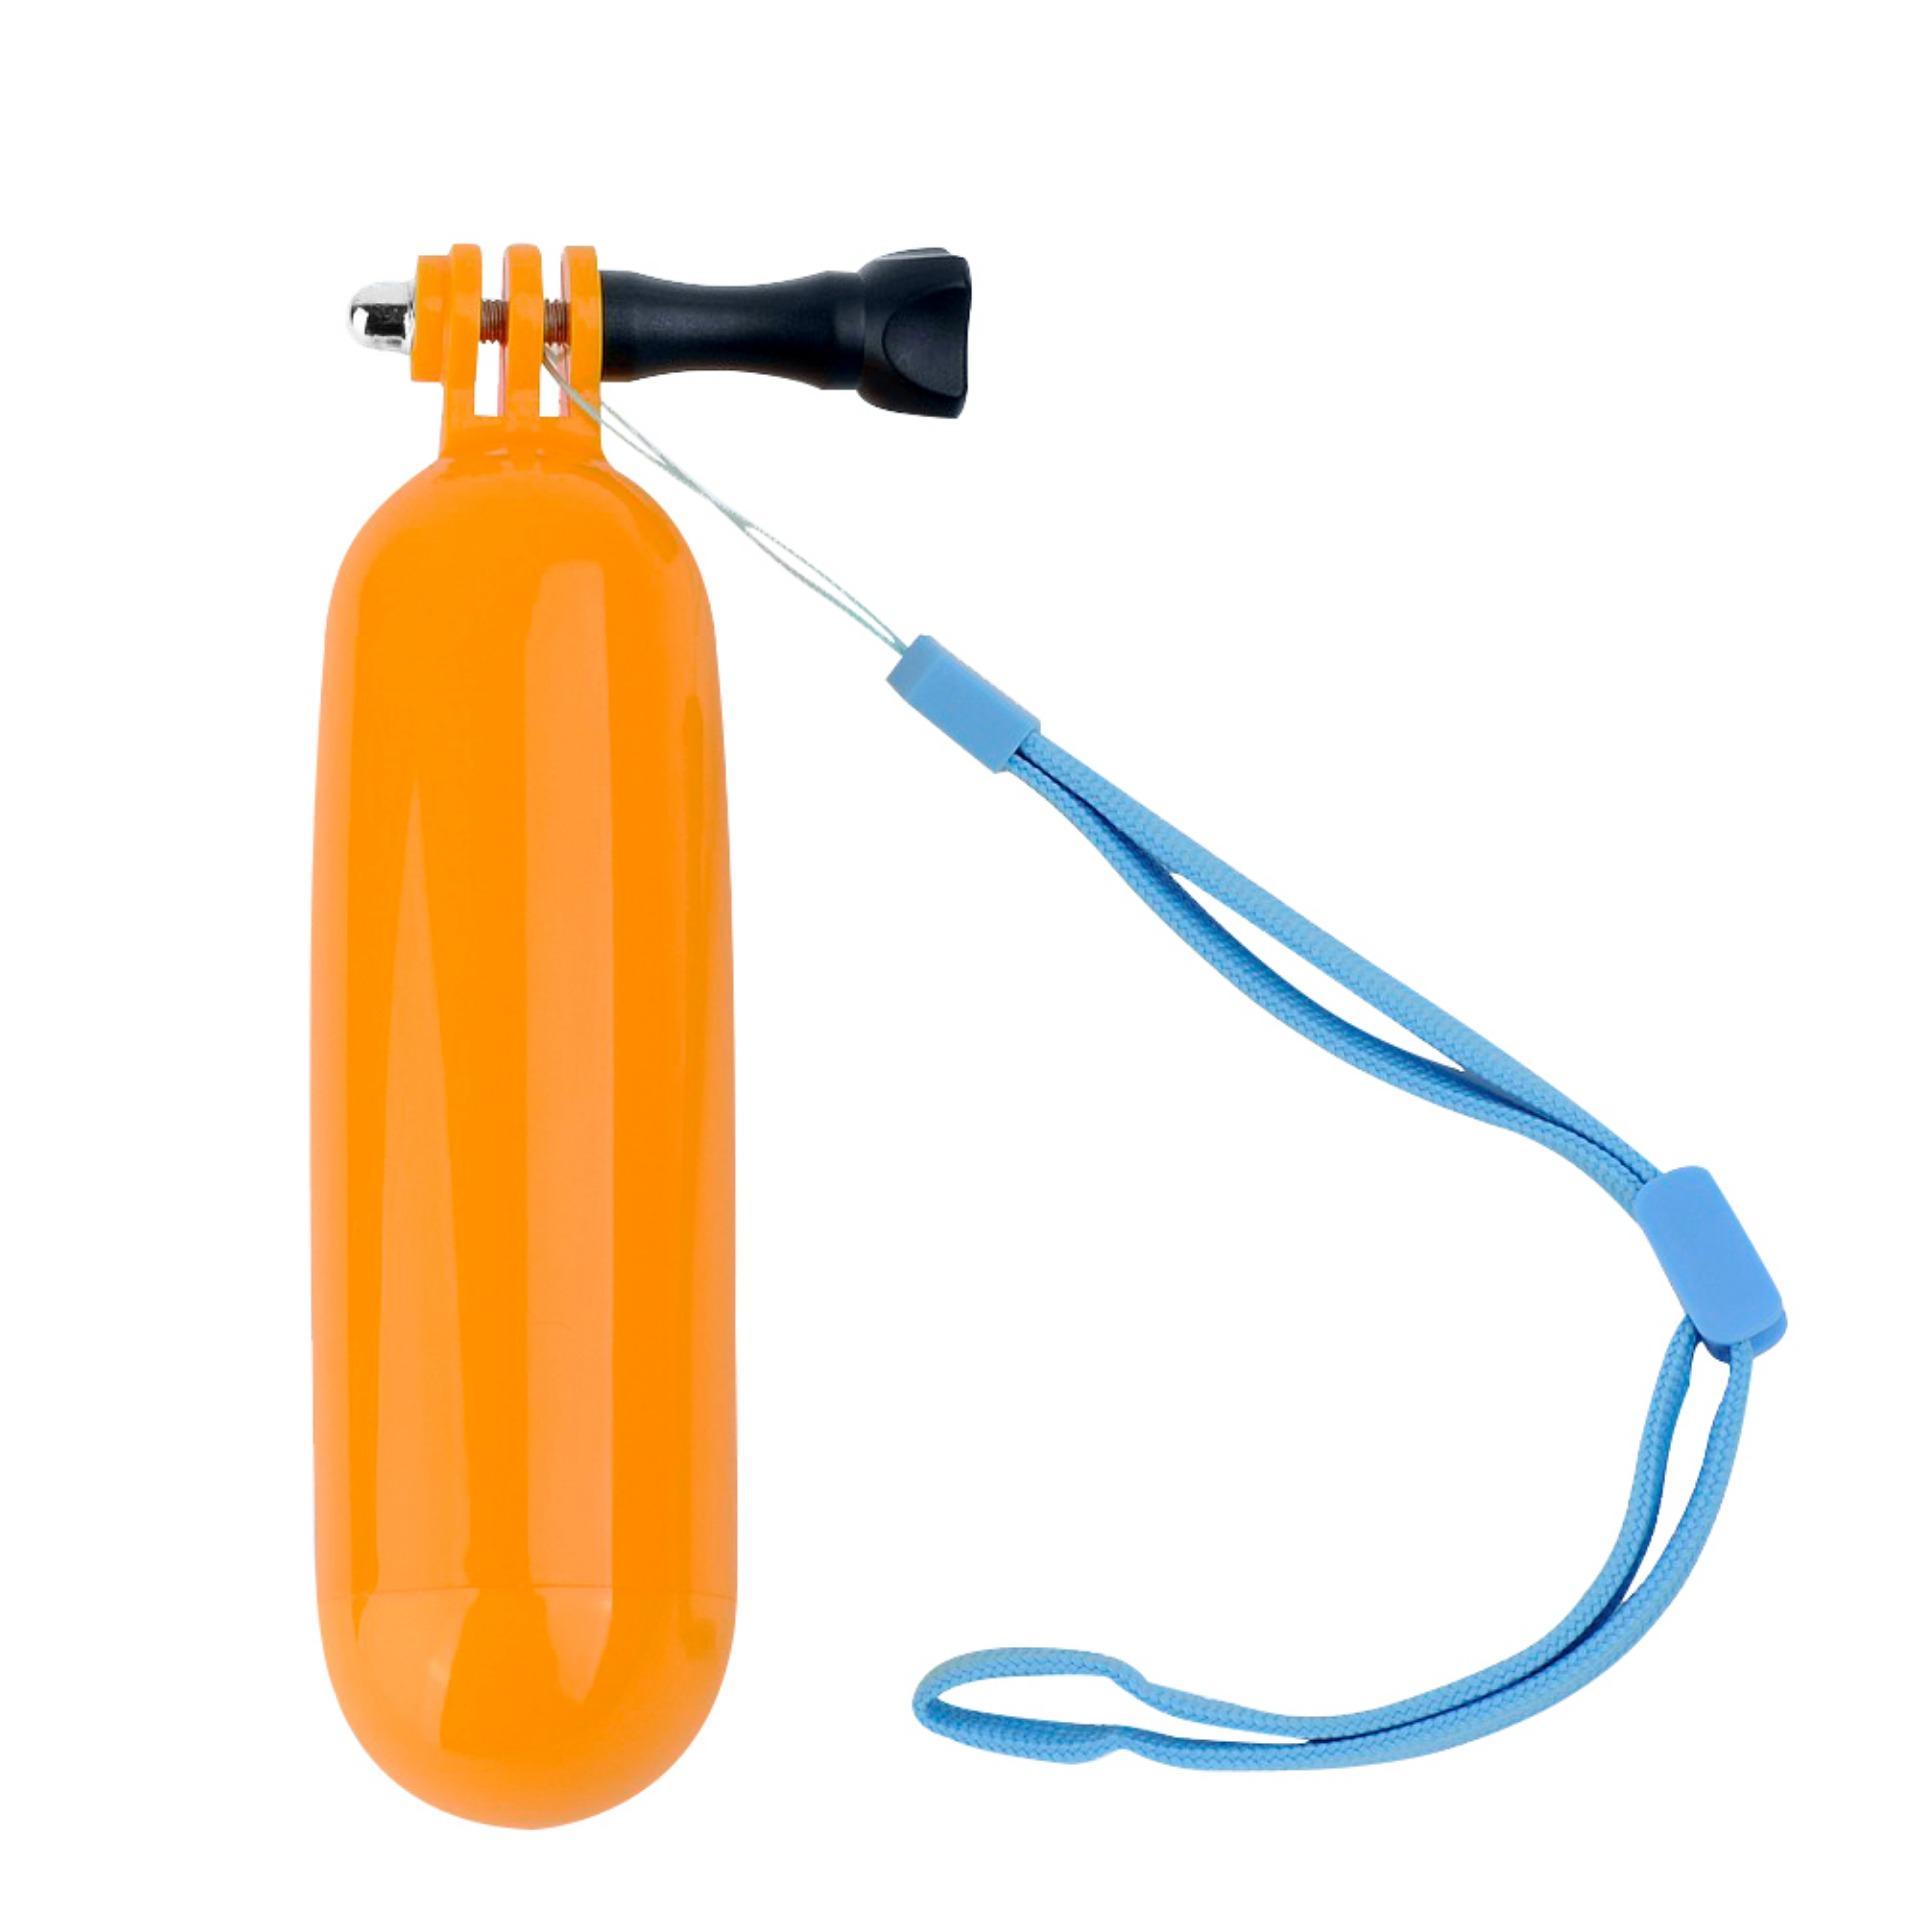 Sjcam Floating Bobber Monopod Grip For Action Camera (orange) By Sjcam.